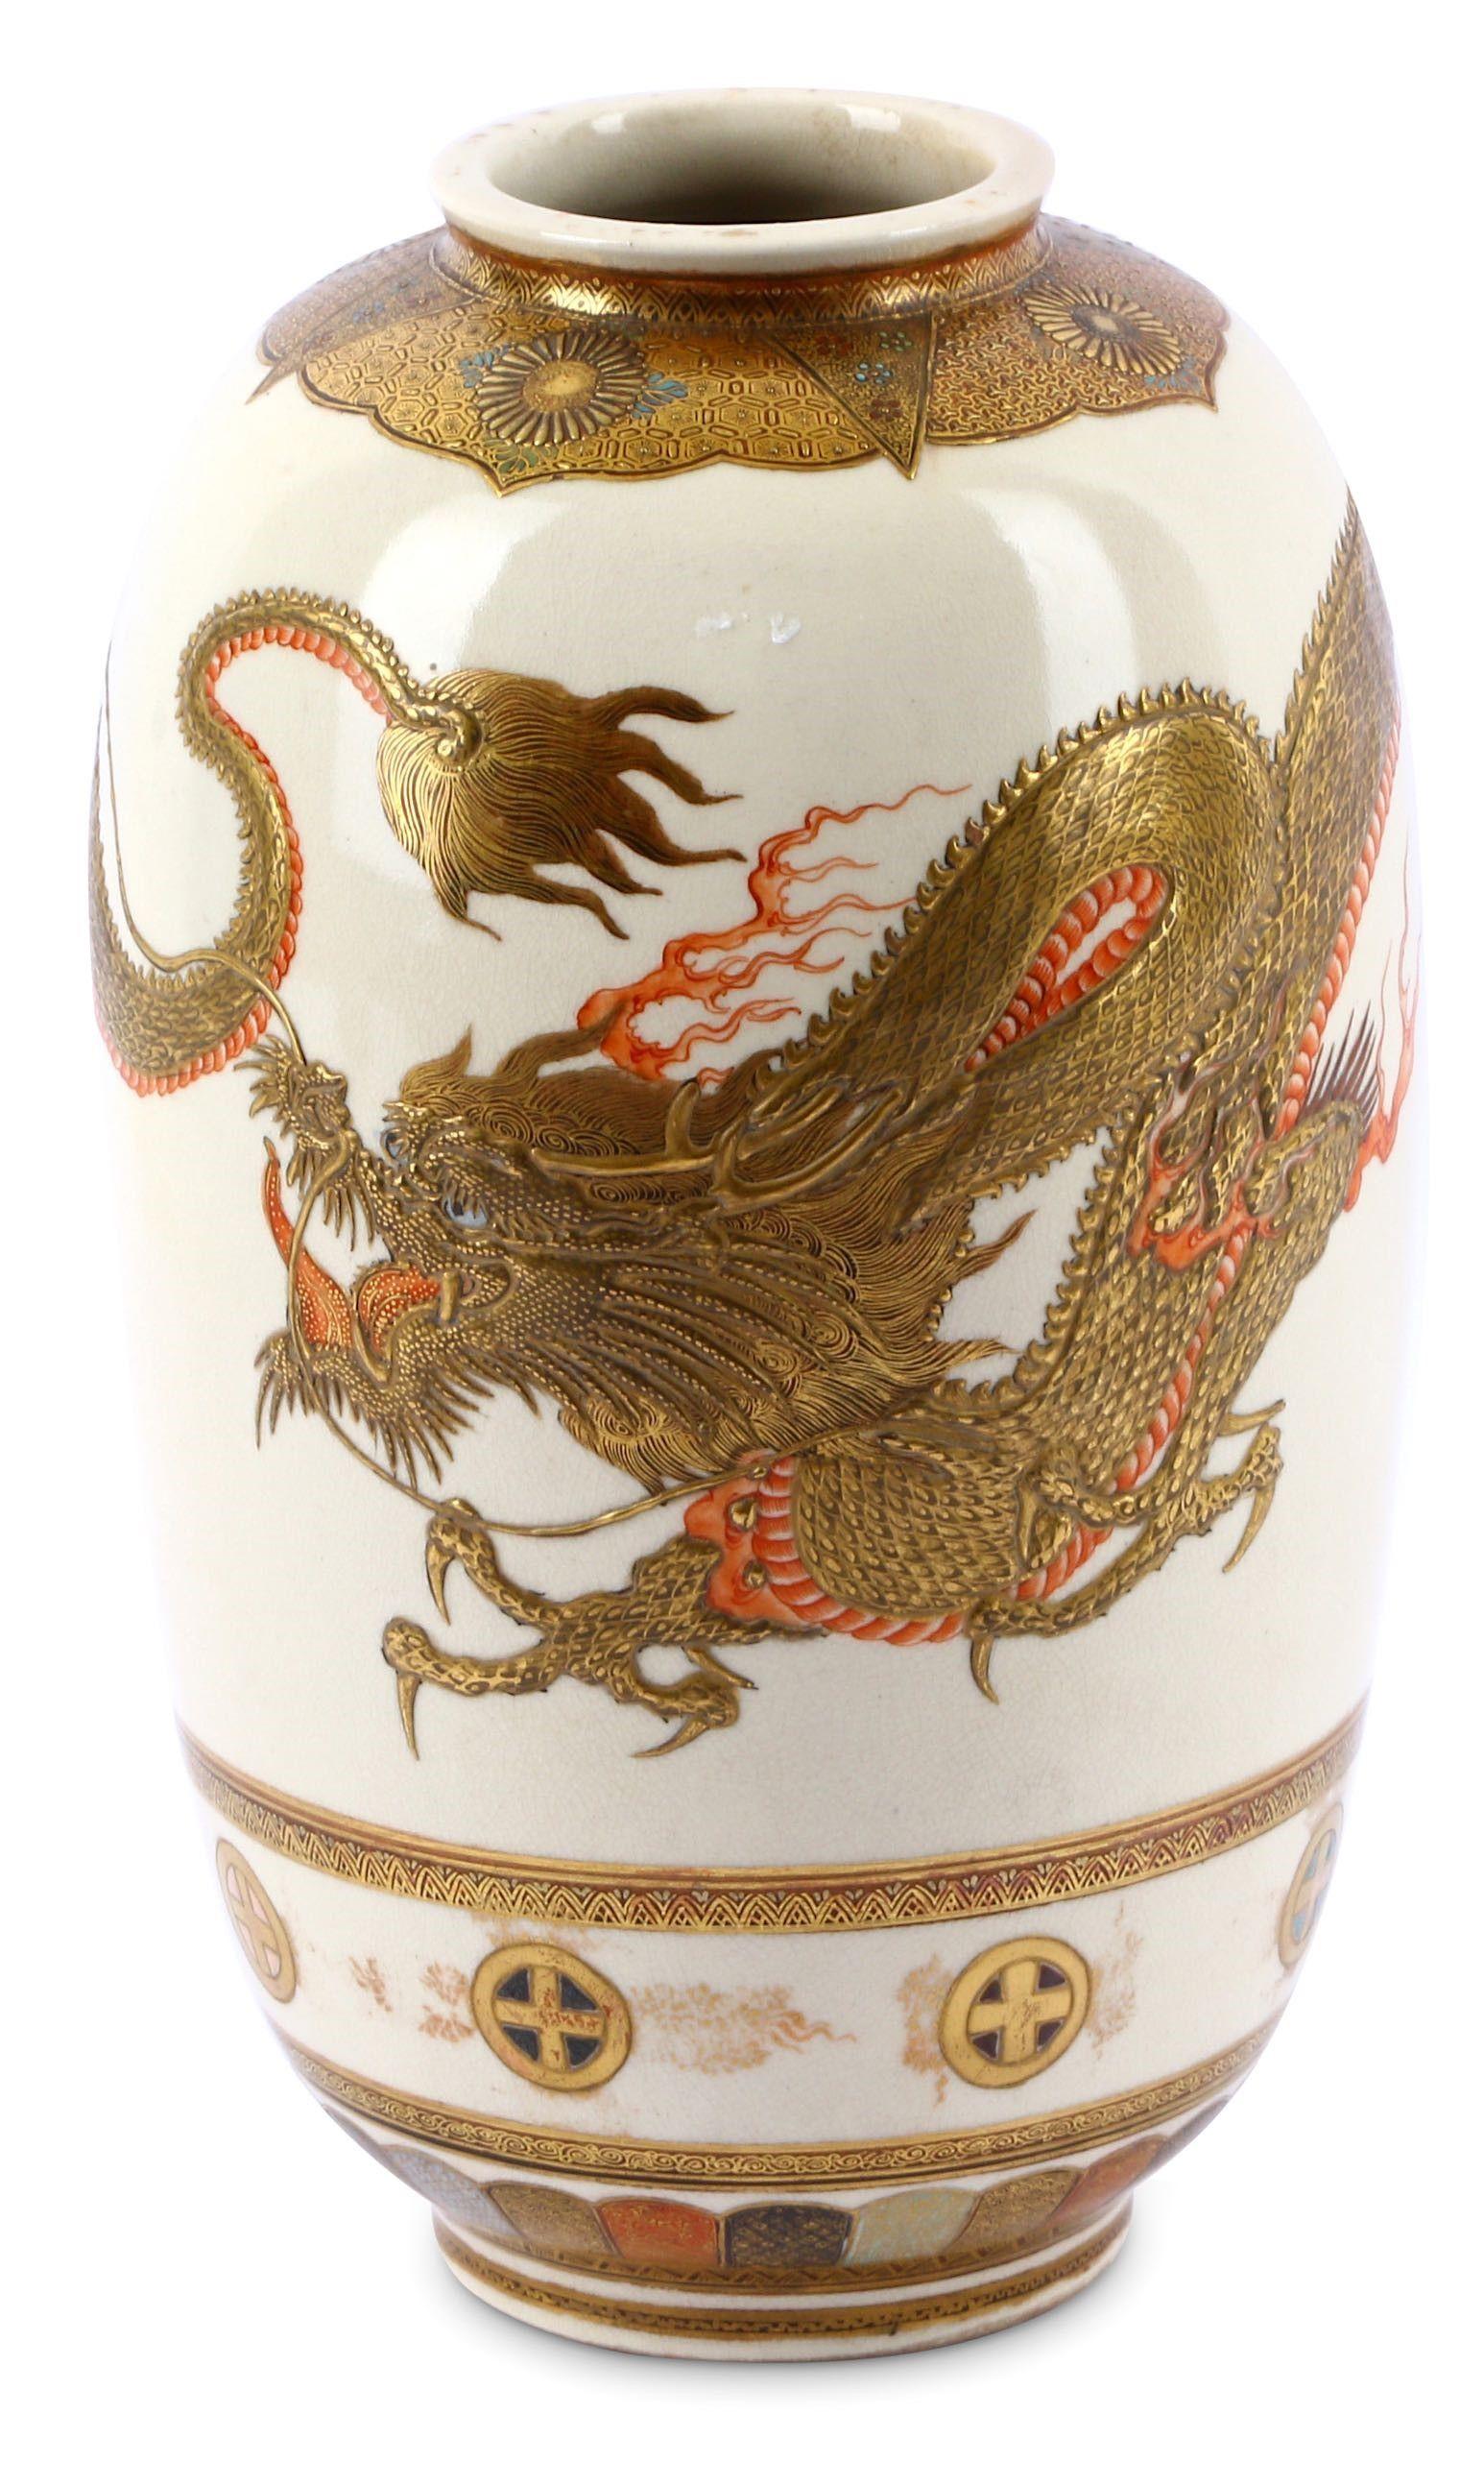 Satsuma Dragon Baluster Vase | Japan - 19th Century | #dragon #dragons #art #antique #ceramic #ware #Jingdezhen #stoneware #porcelain #pottery #auction #history #poterie #céramique #sculpture #celadon #antiquité #brocante #stoneware #museum #sancai #nankin #dynasty #tang #ming #song #tong #yuan #Qianlong #qing #Cizhou #meiping #imperial #period #chine #drachen #drache #drago #Japan #meiji #satsuma #Shenlong #Tianlong #Qiulong #Panlong #longshan #ryū #龍 #竜 #龙